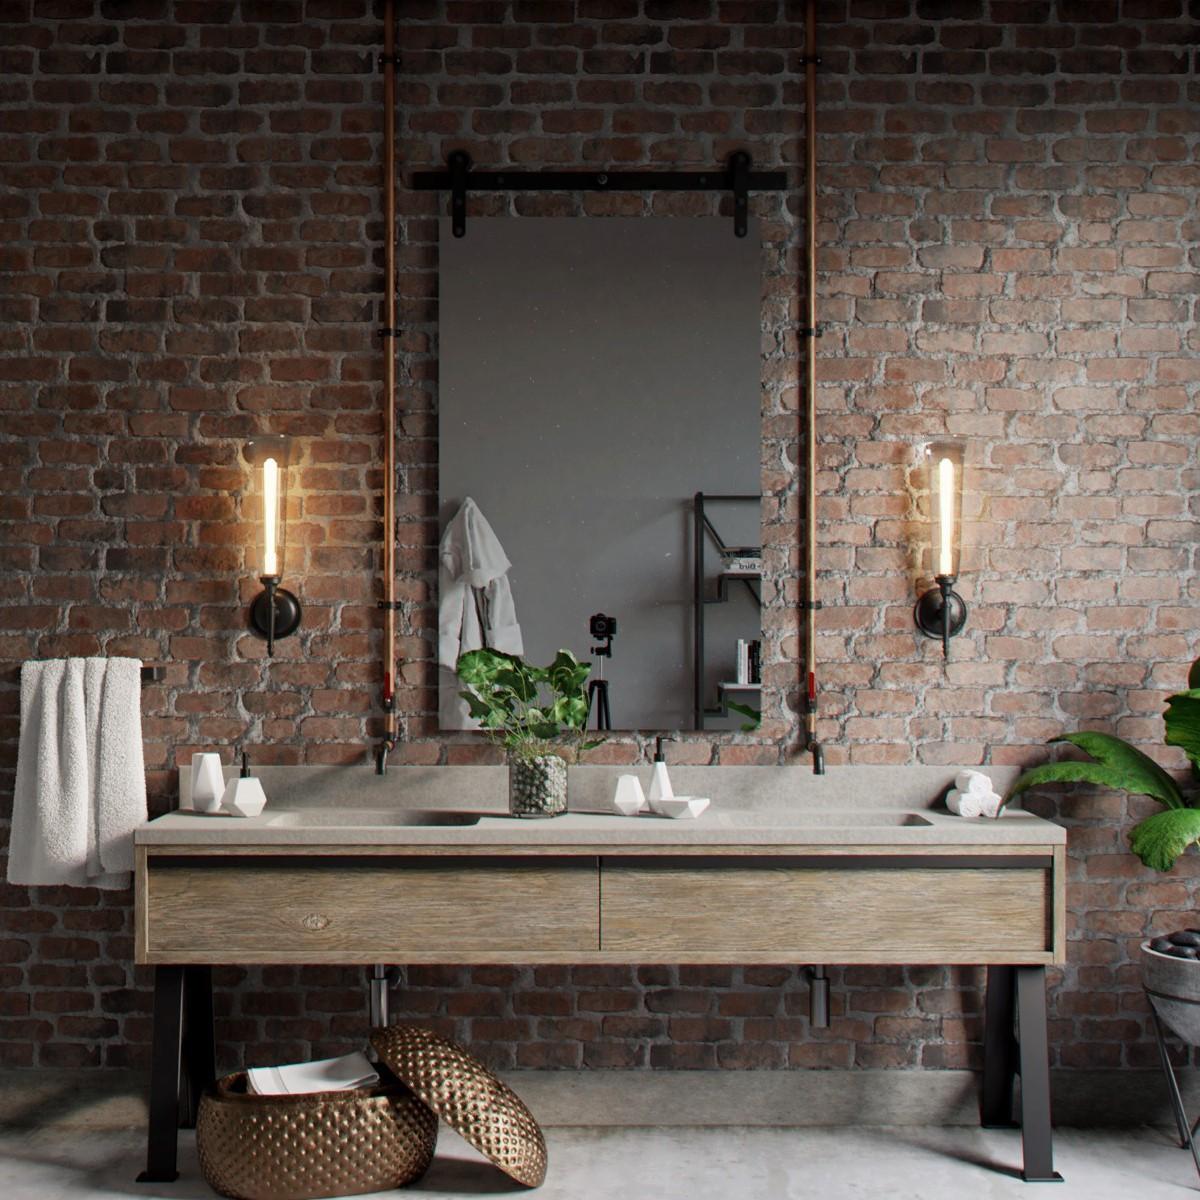 Bathroom Color Schemes, colorful bathroom, black bathroom, pink bathroom, rustic bathroom, bathroom, red bathroom Bathroom Color Schemes 5 Bathroom Color Schemes for Embellish your Decor industrial style bathroom mirror 1